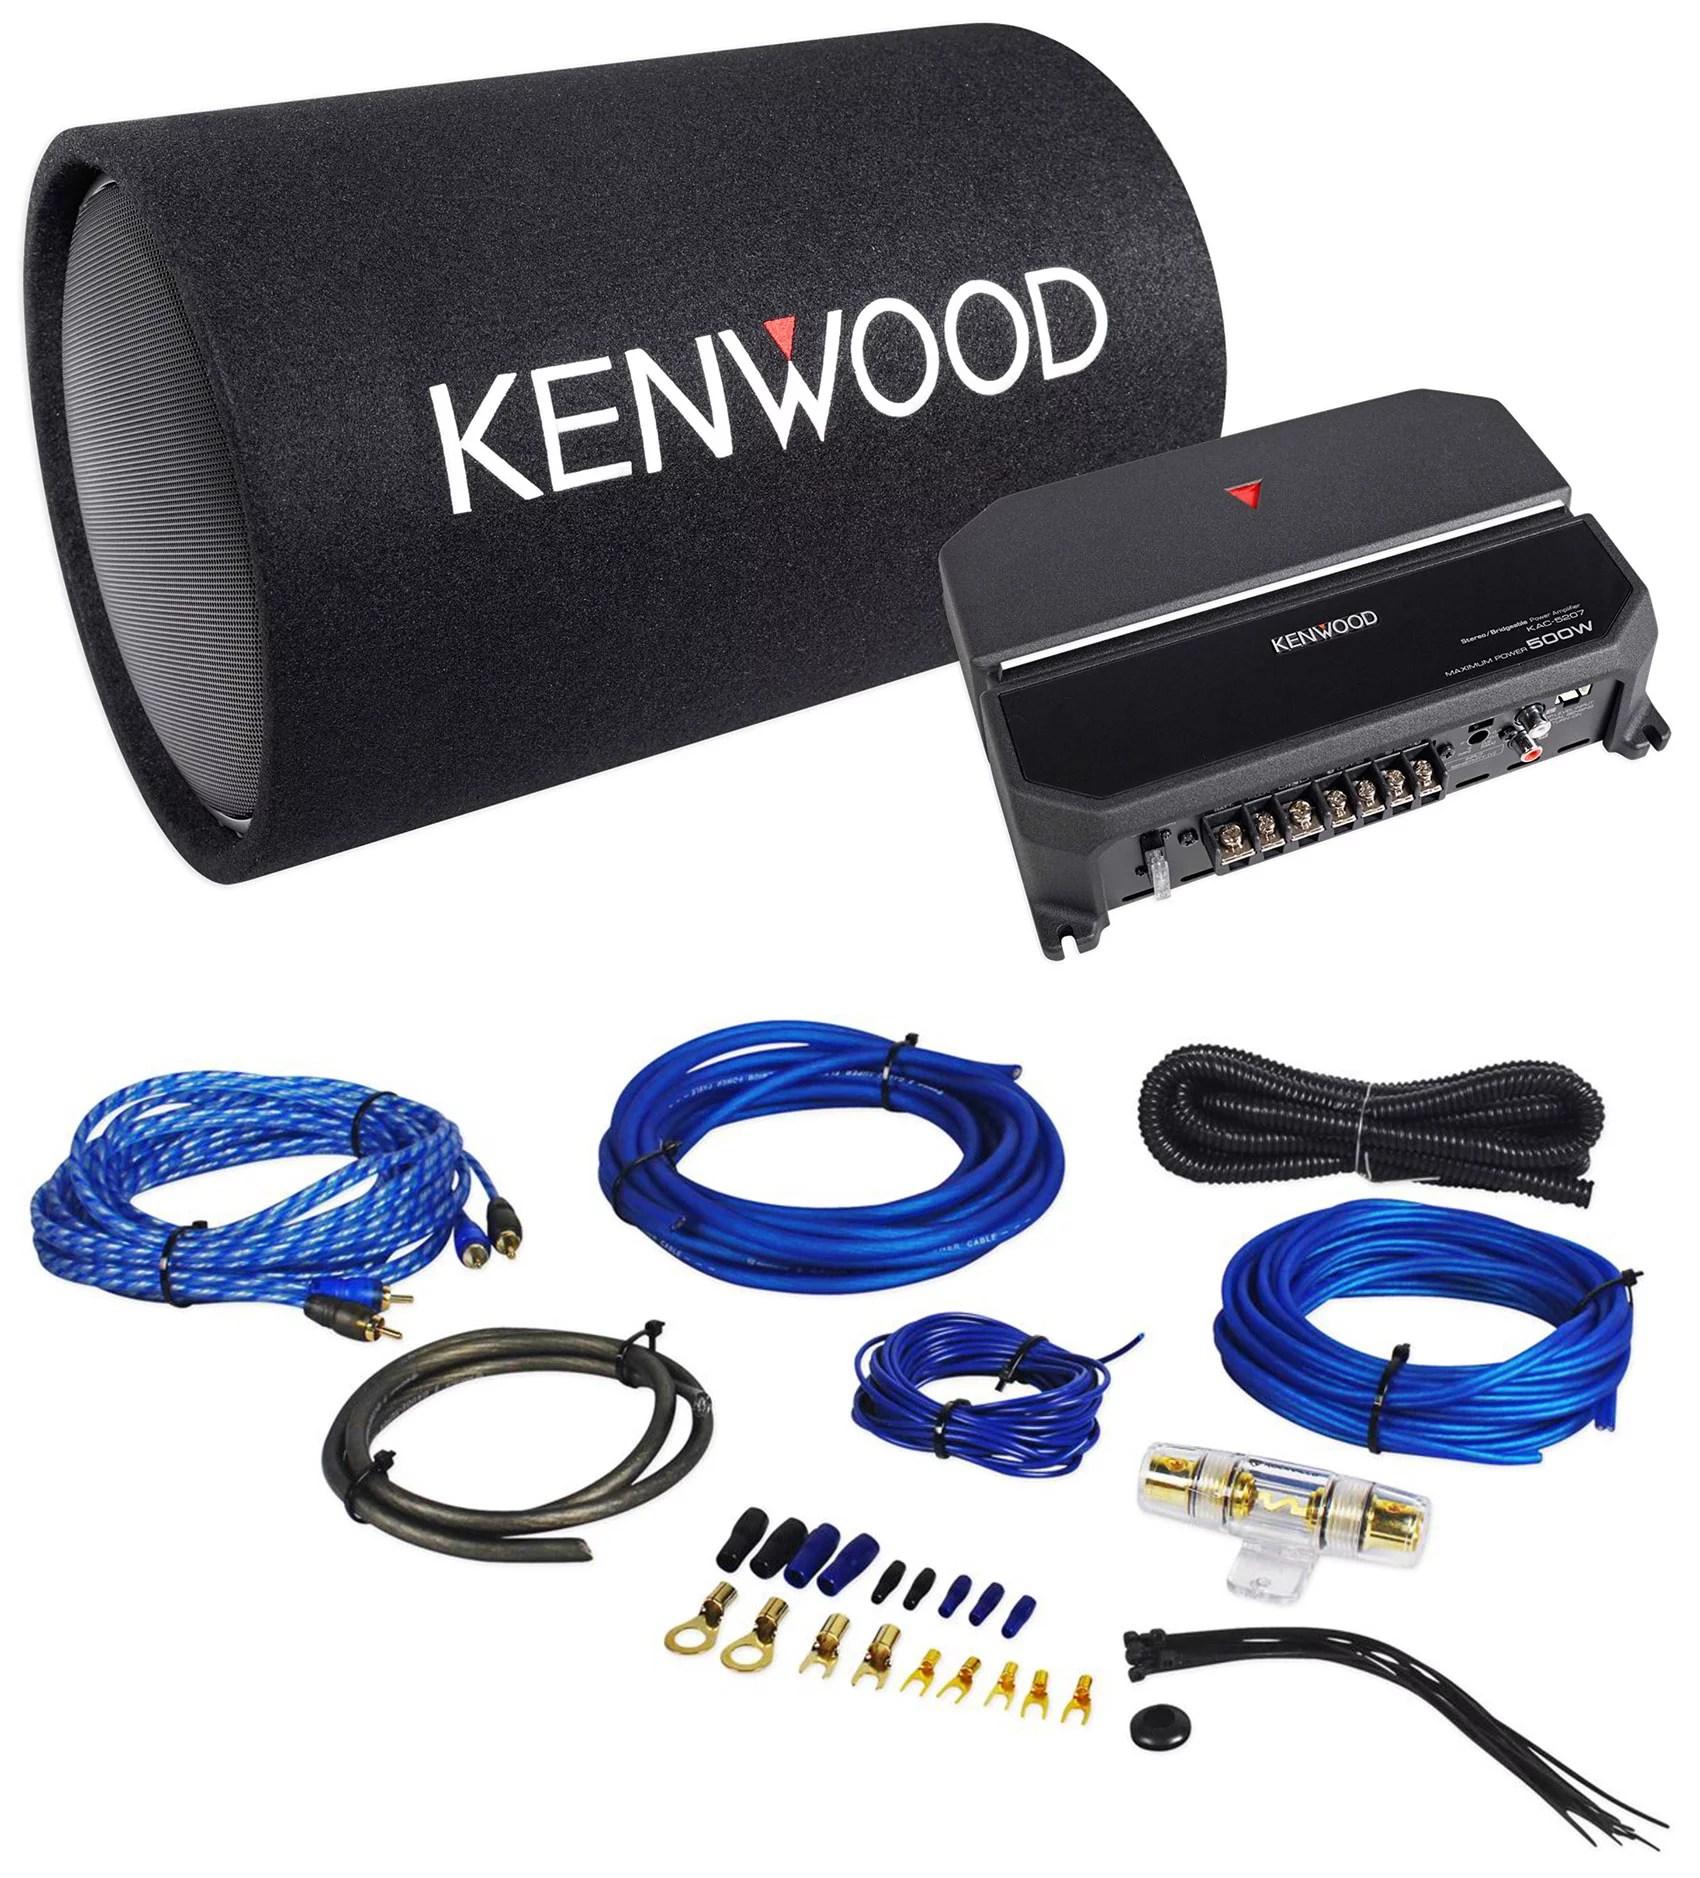 hight resolution of kenwood p w131tb 12 1200 watt car audio subwoofer bass tube amplifier wire kit walmart com